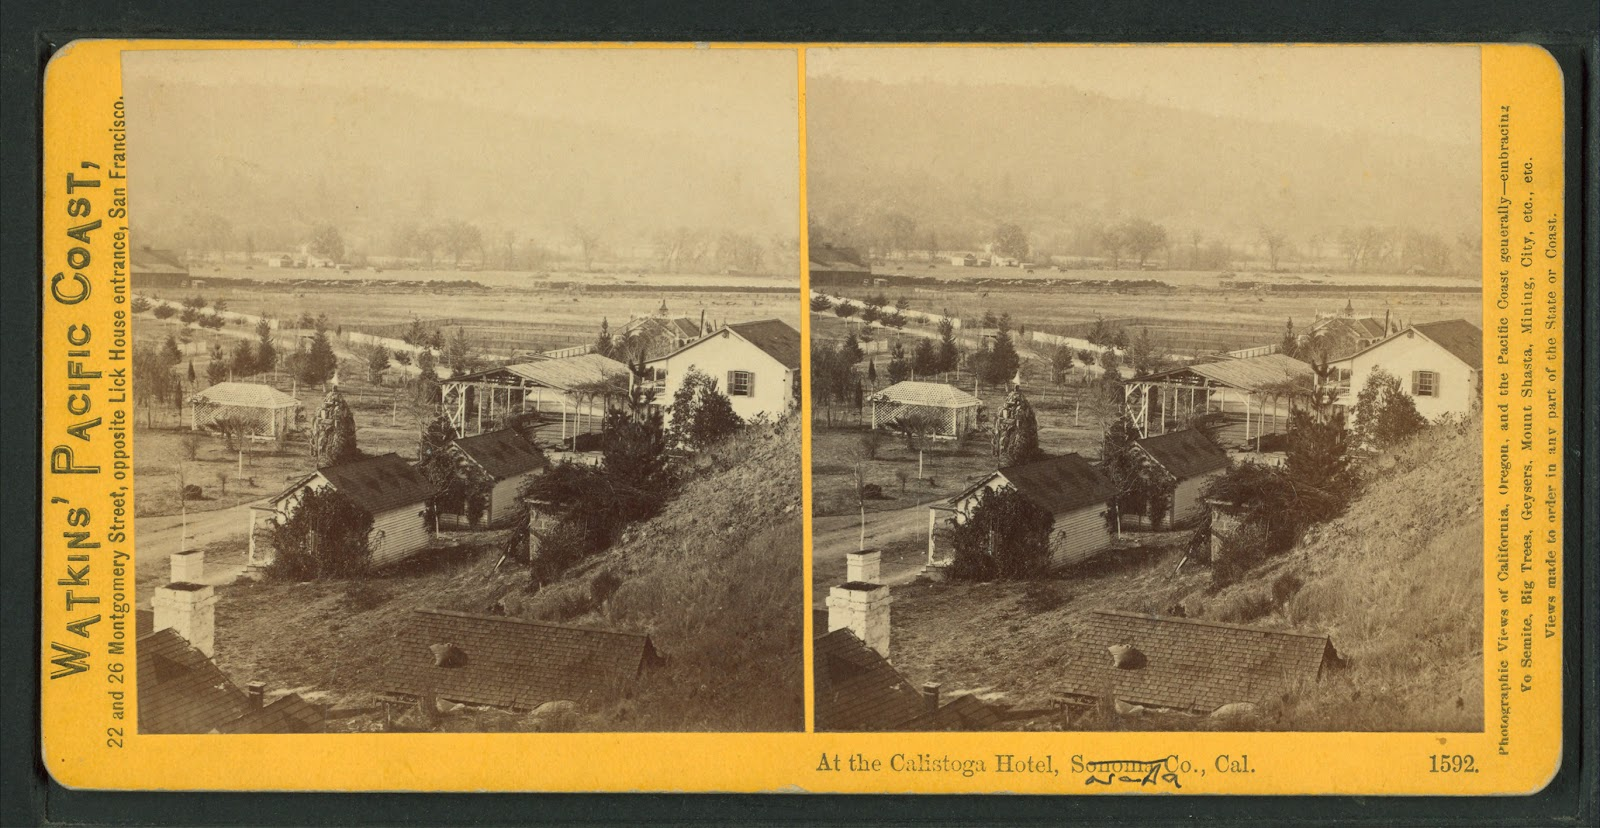 Historical 03 Calistoga_Hotel,_Napa_Co_,_Cal,_by_Watkins,_Carleton_E_,_1829-1916